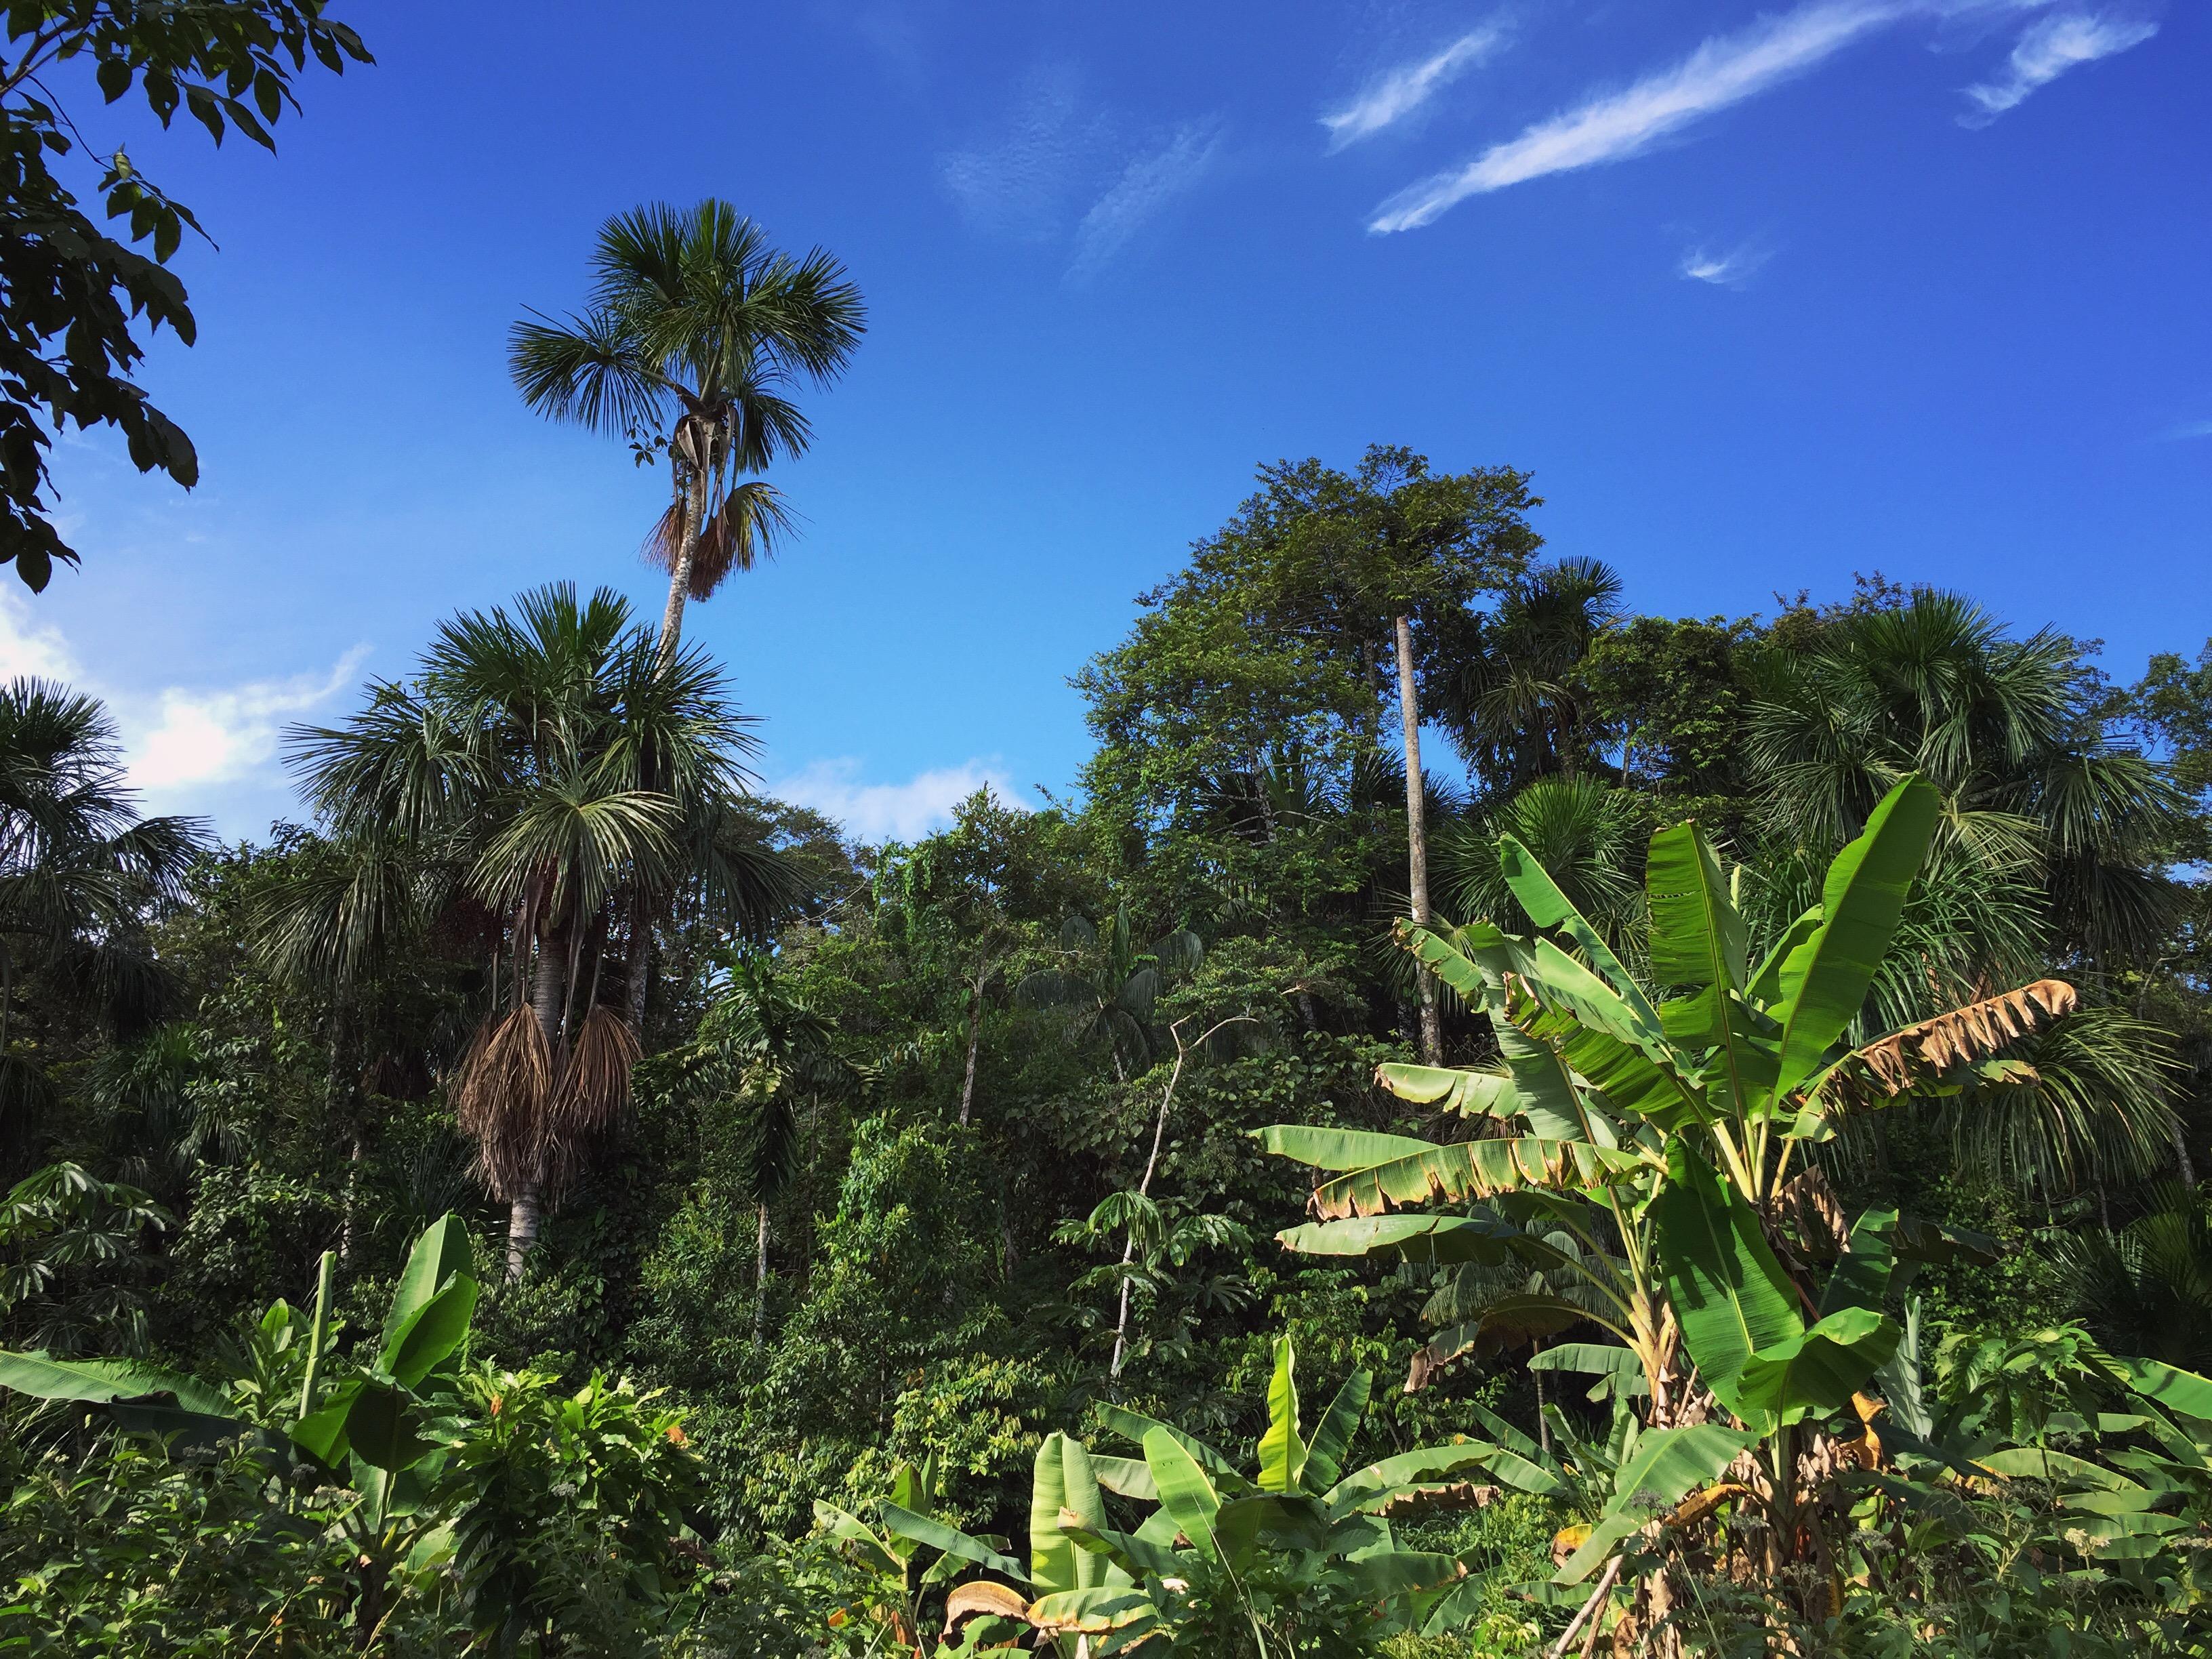 Iphone 6 Beach Wallpaper Free Stock Photo Of Amazon Rain Forest Amazonian Jungle